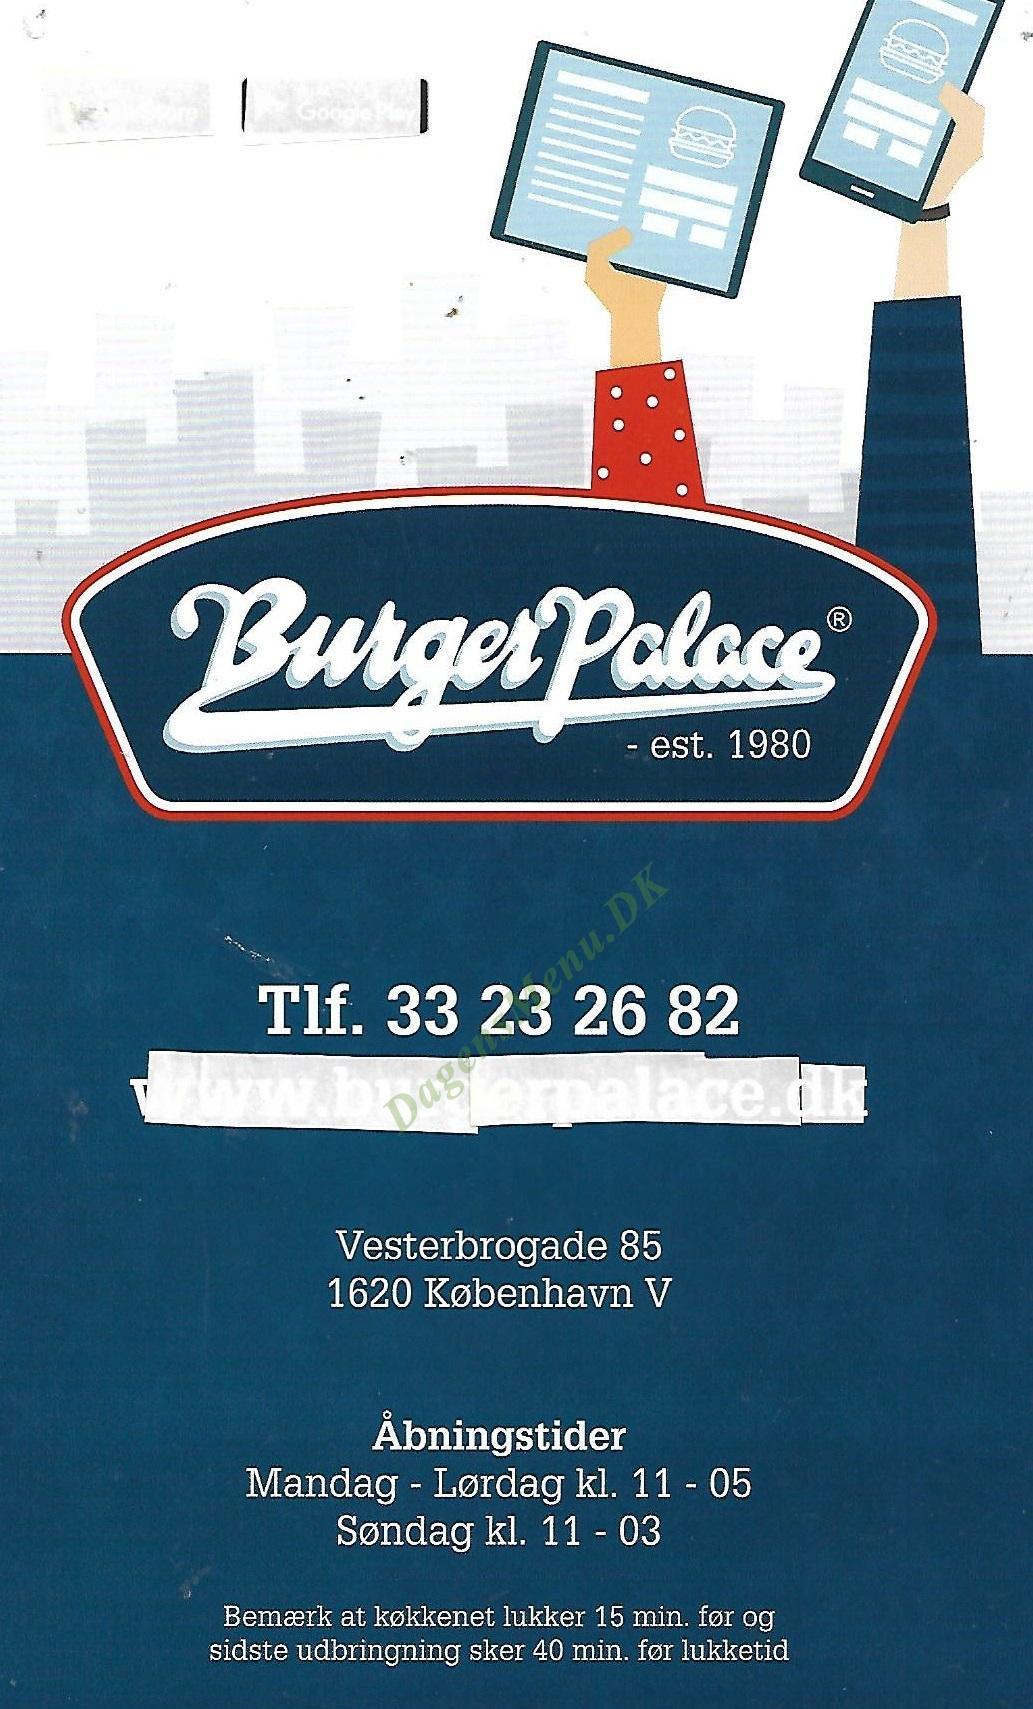 Burger Palace - Menukort